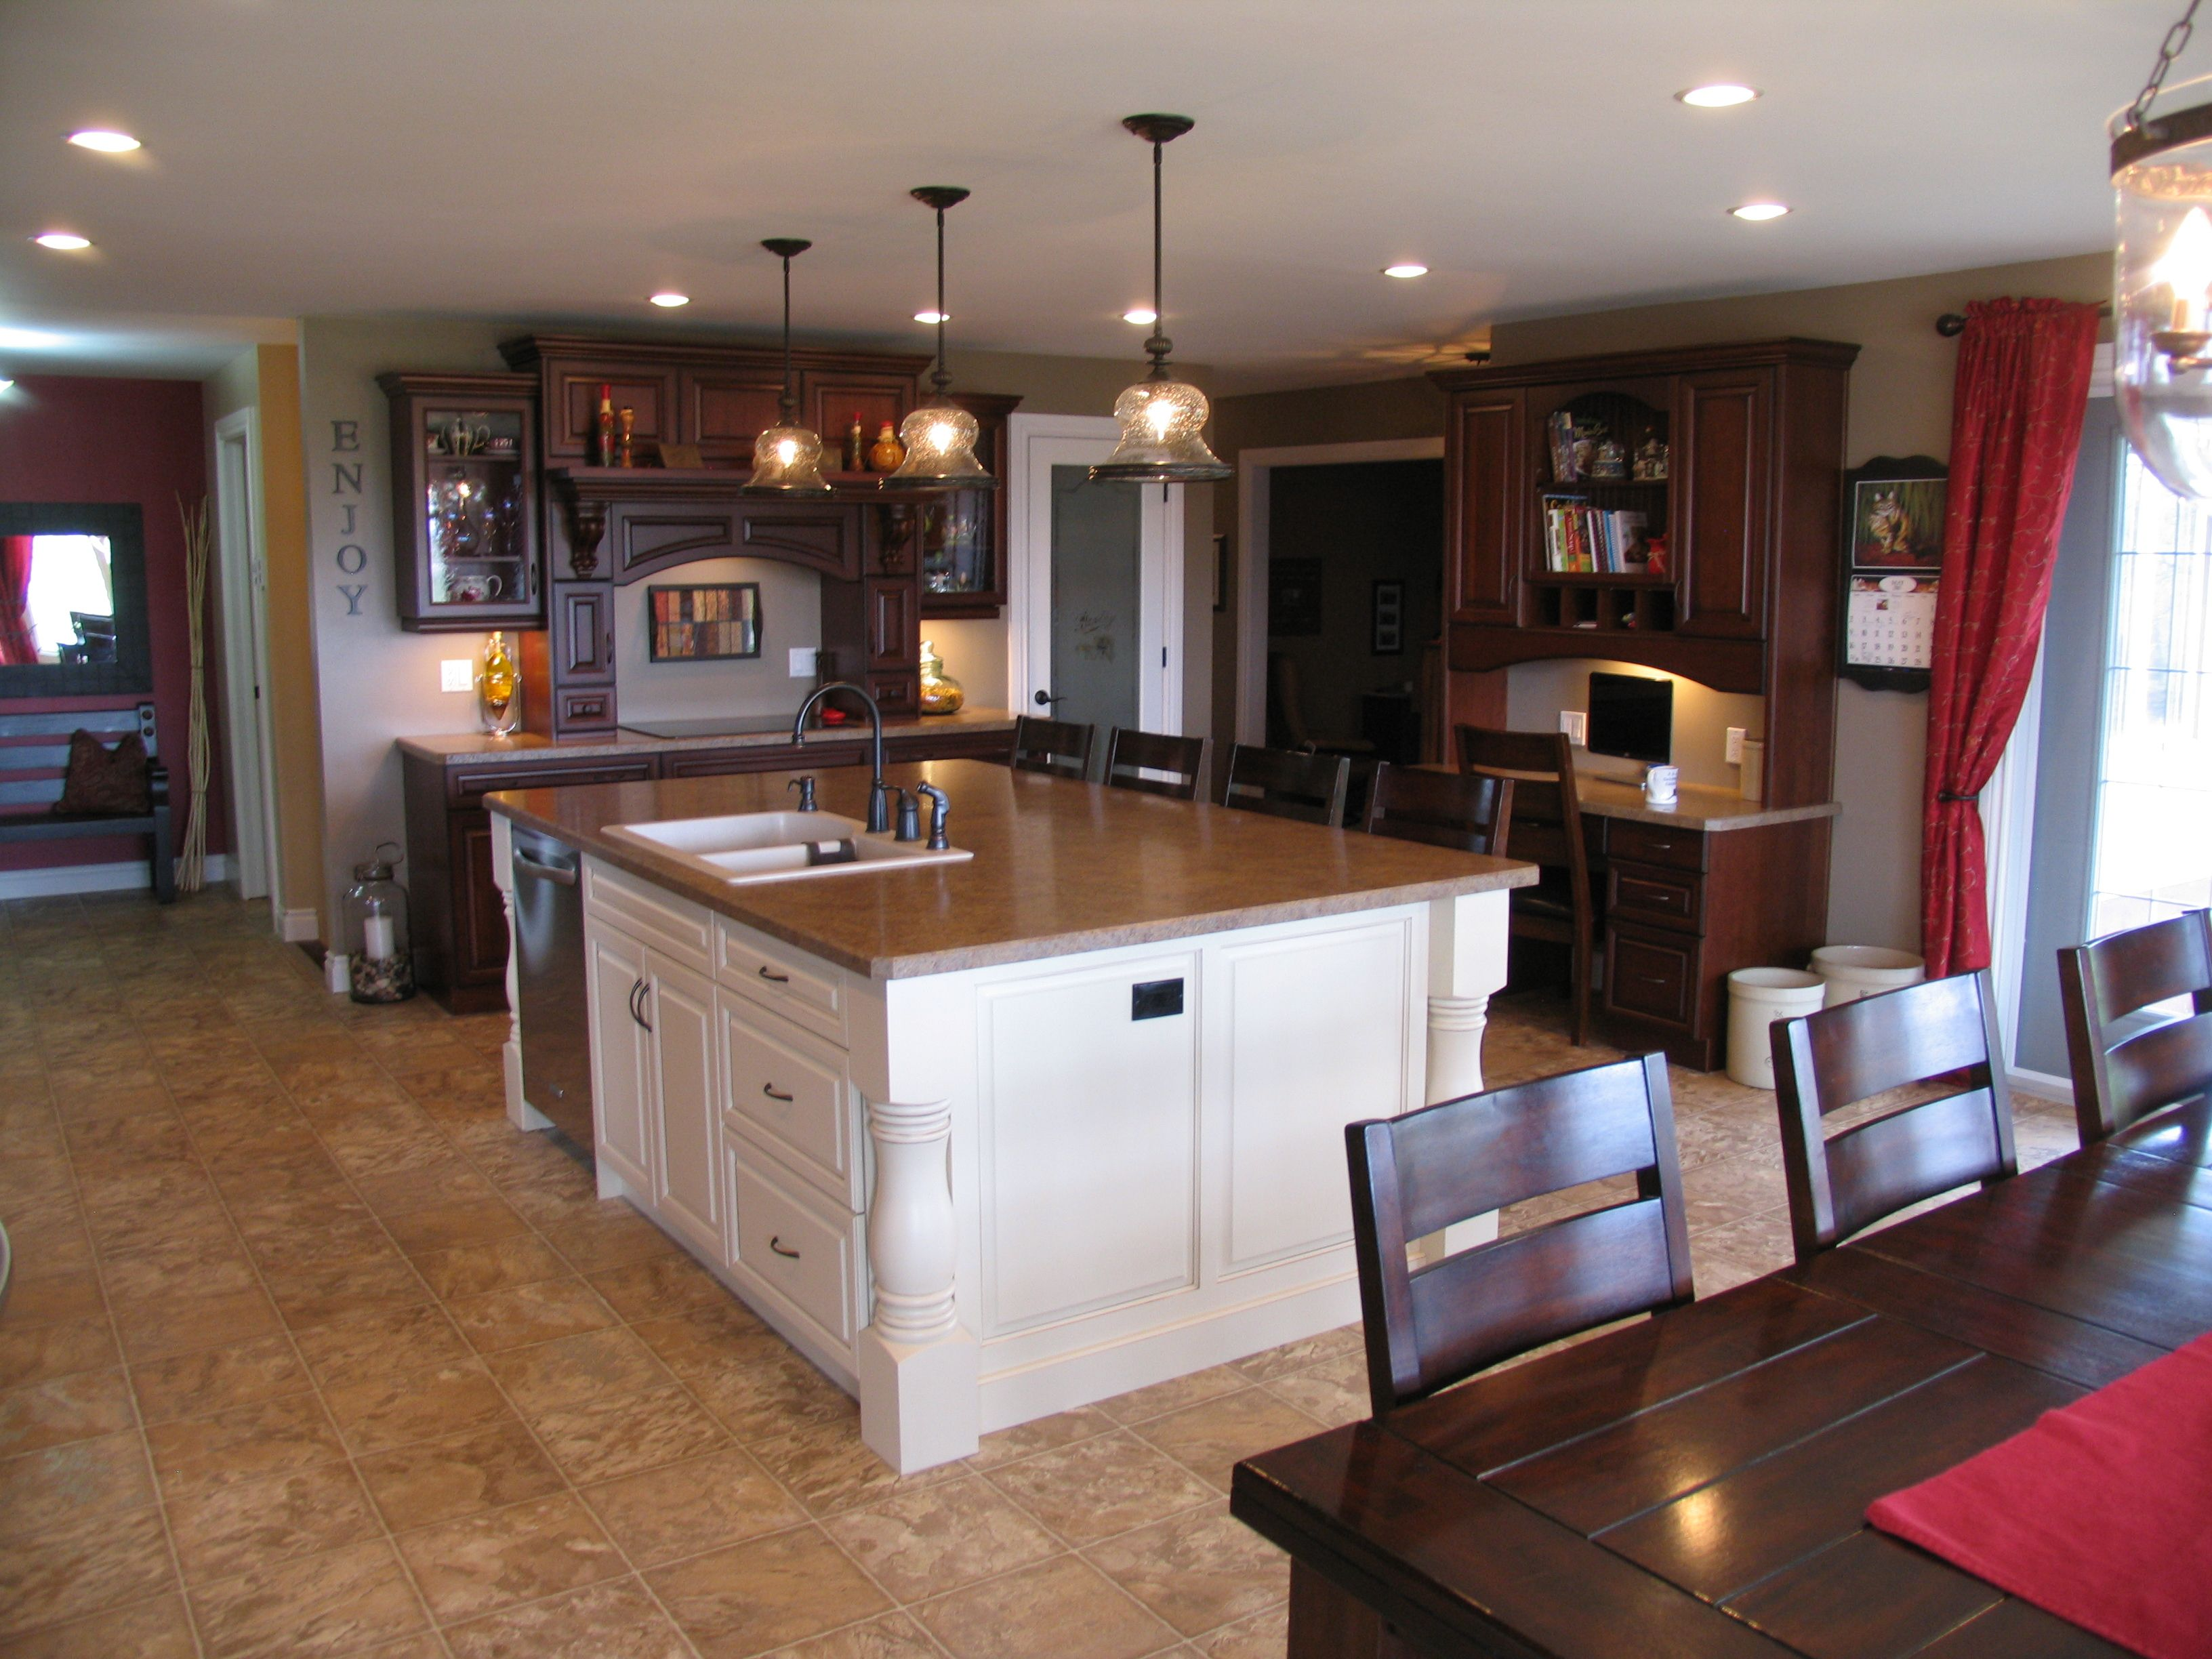 refinishing kitchen laminate countertops fresh refinish charming